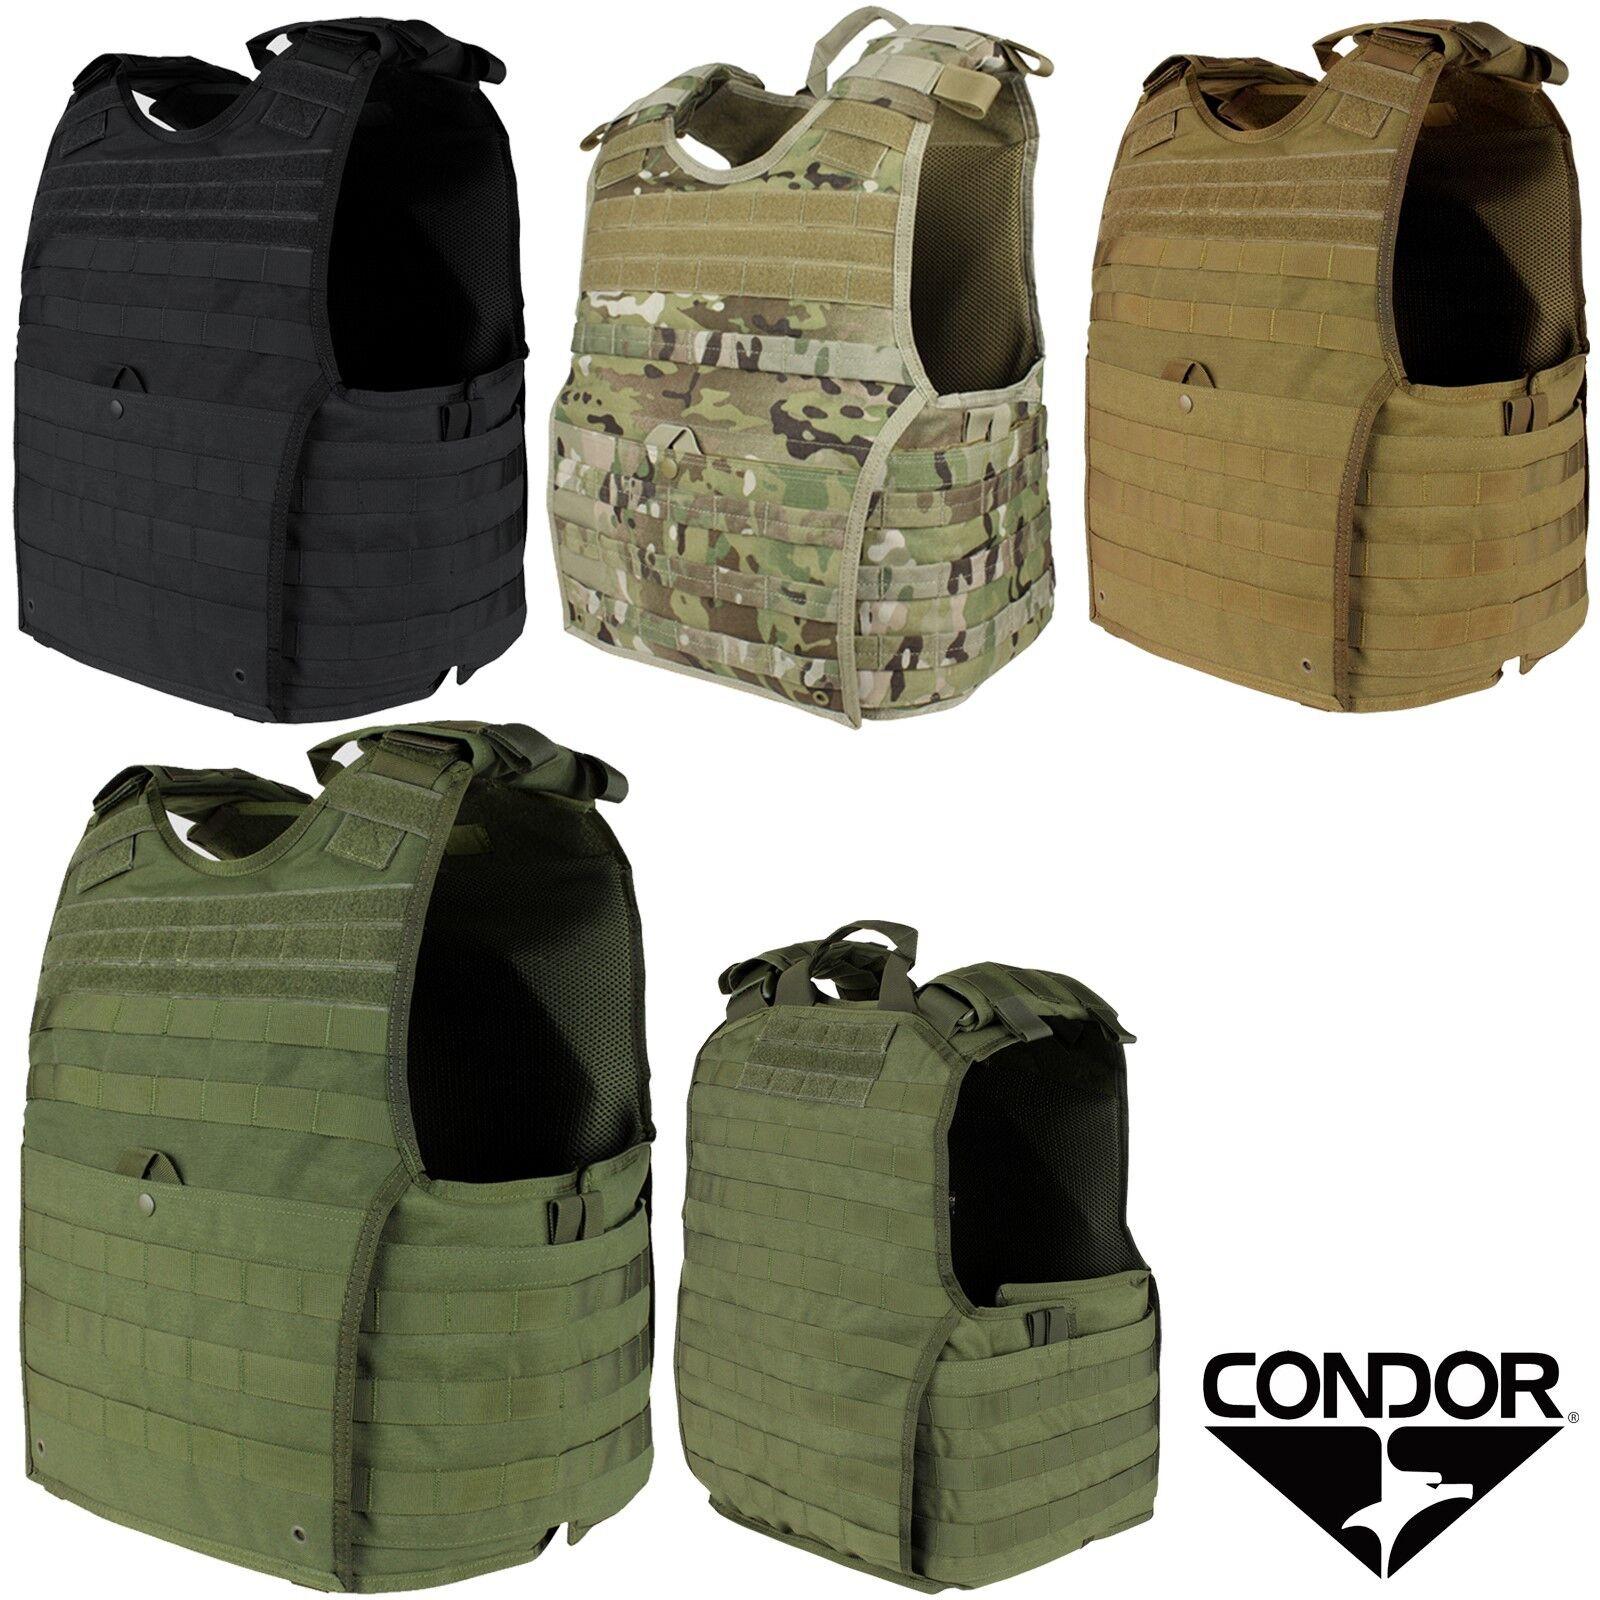 Condor Tactical Modular MOLLE BALCS SPEAR Soft Armor Exo Plate Carrier Gen  II fcc2fd035d56